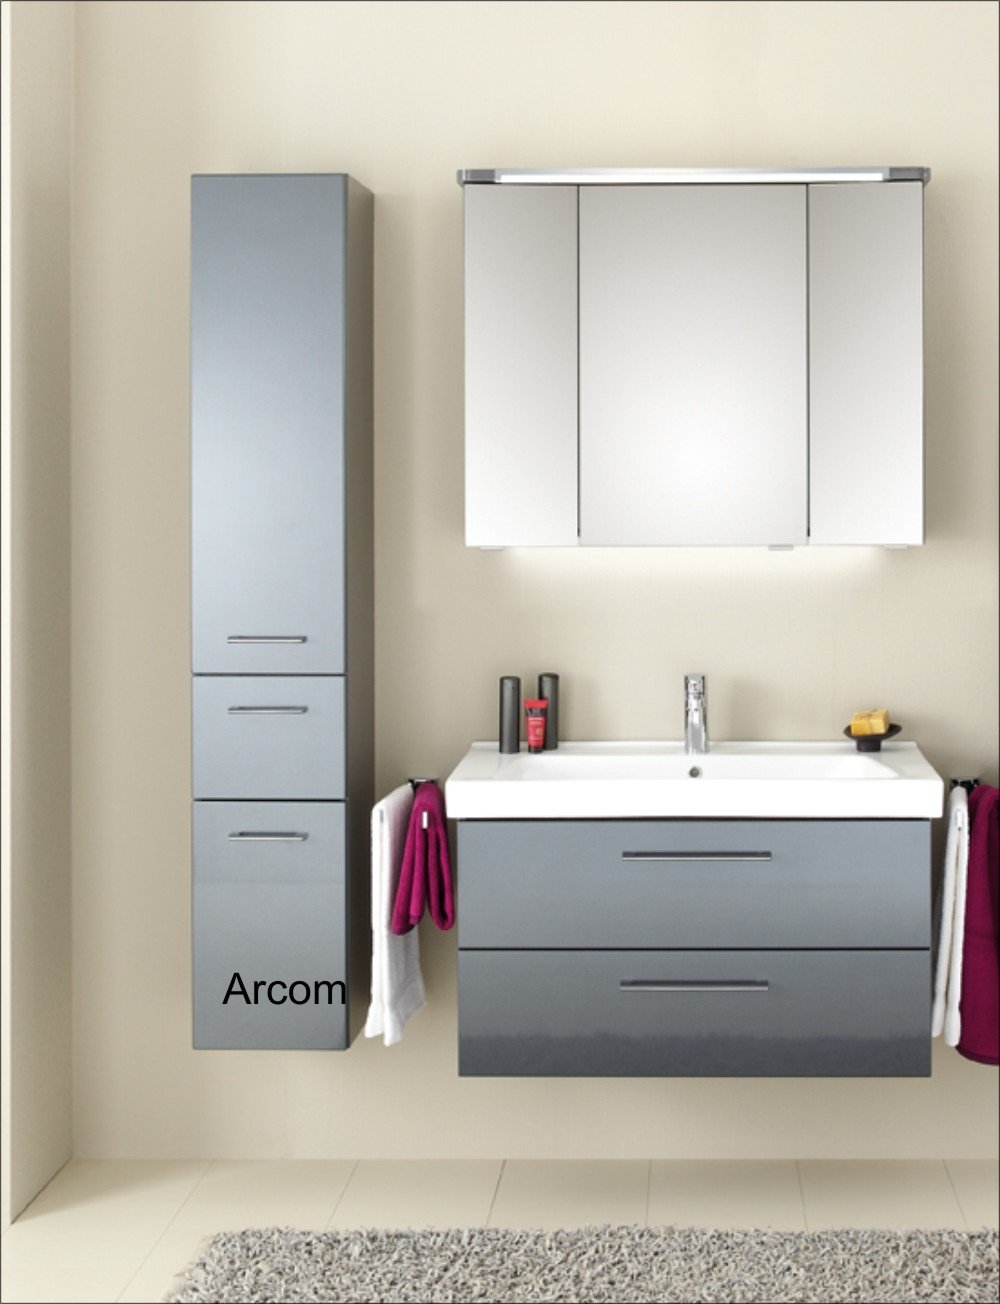 hochschrank pineo badschrank g nstig. Black Bedroom Furniture Sets. Home Design Ideas